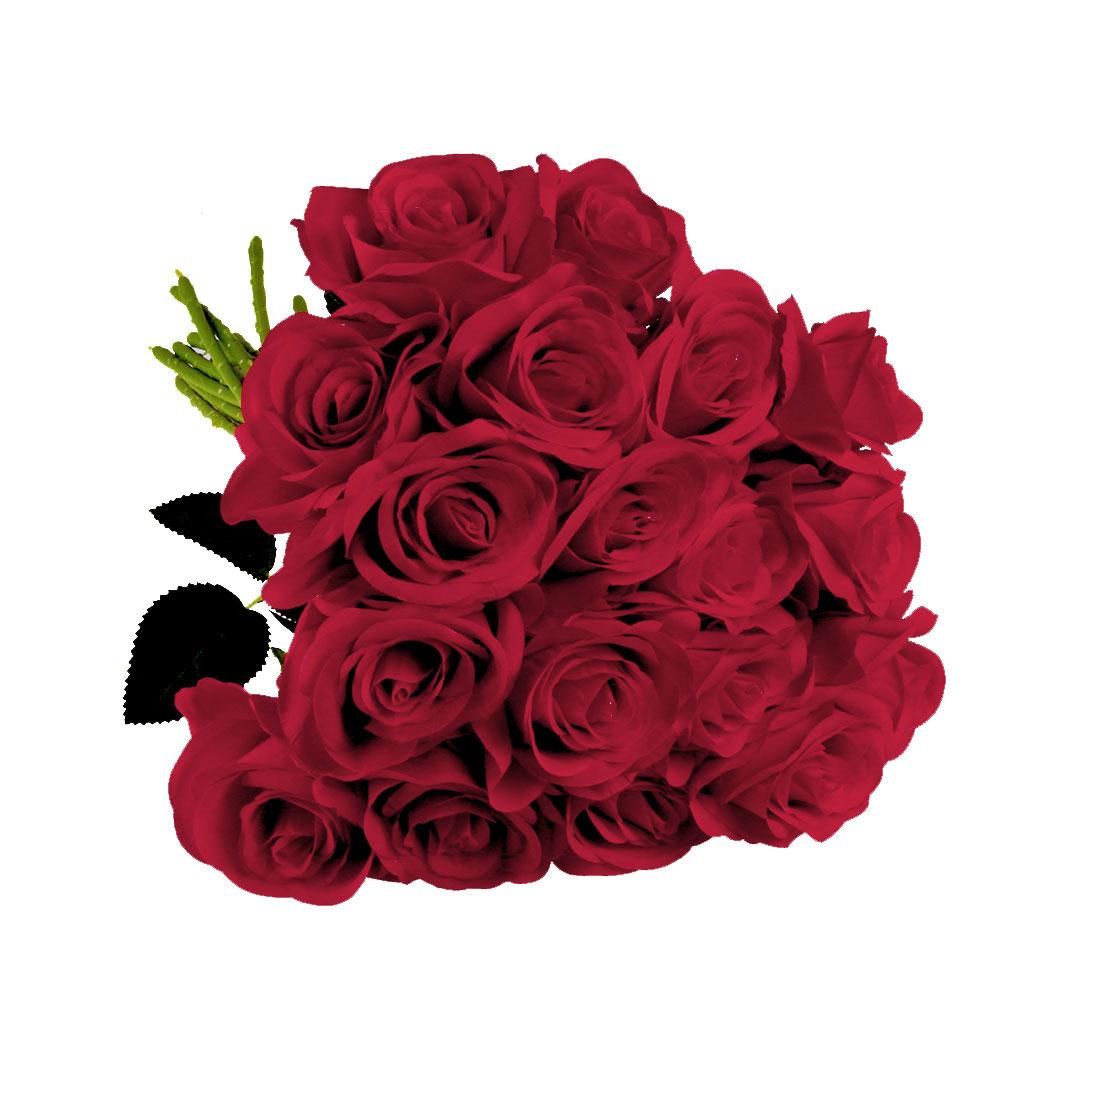 Artificial Silk Vintage Rose Flowers Bouquet Wedding Home Decoration Red 18pcs